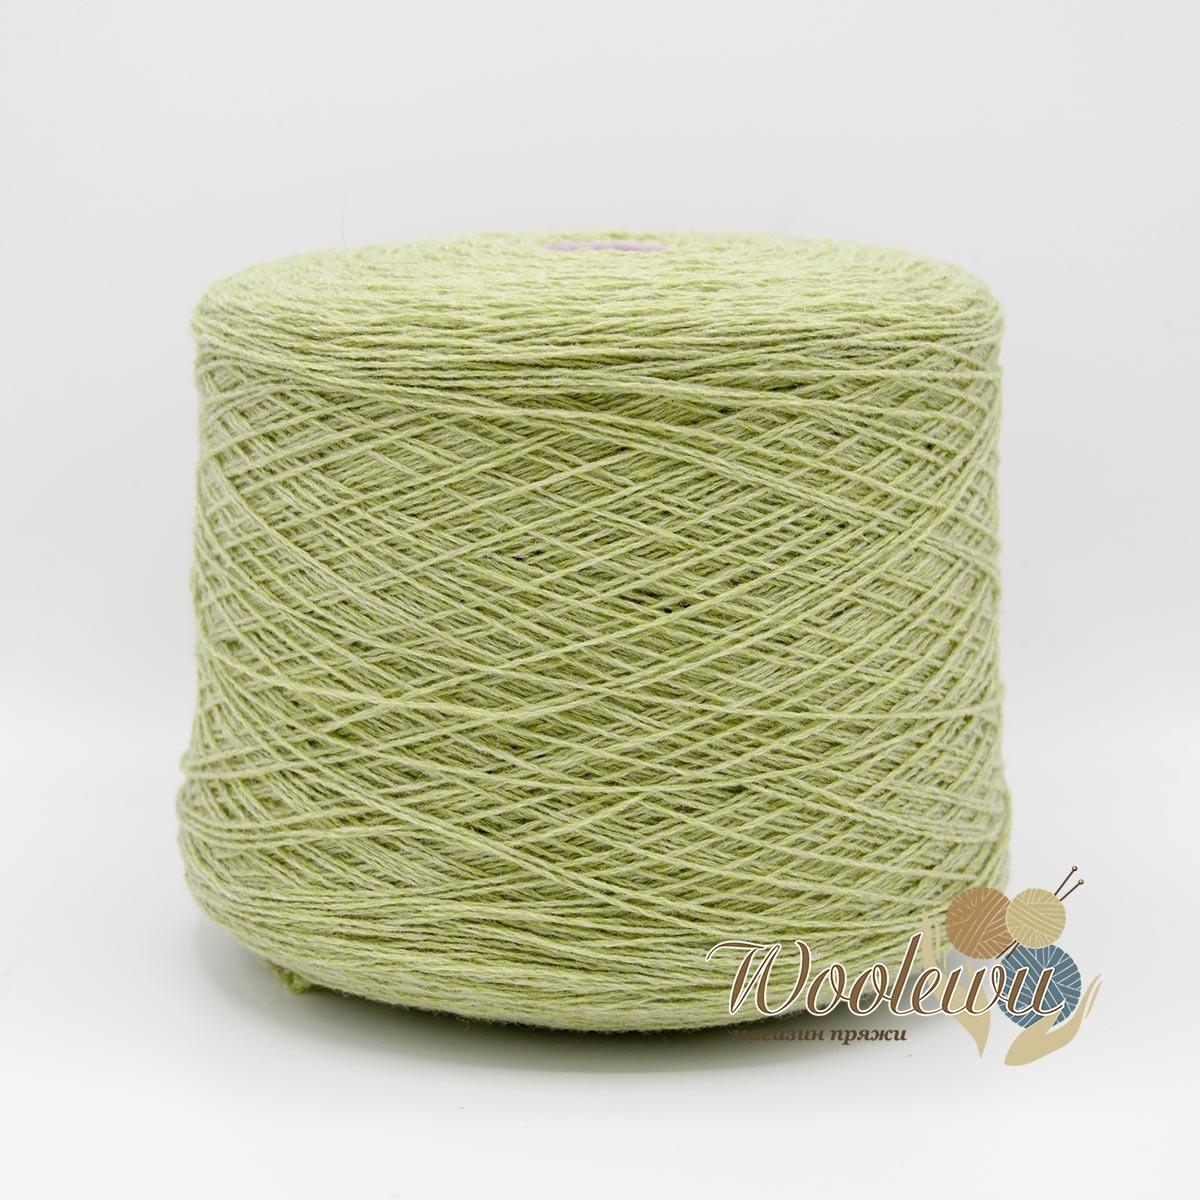 Knoll Yarns Merino Lambswool - 110